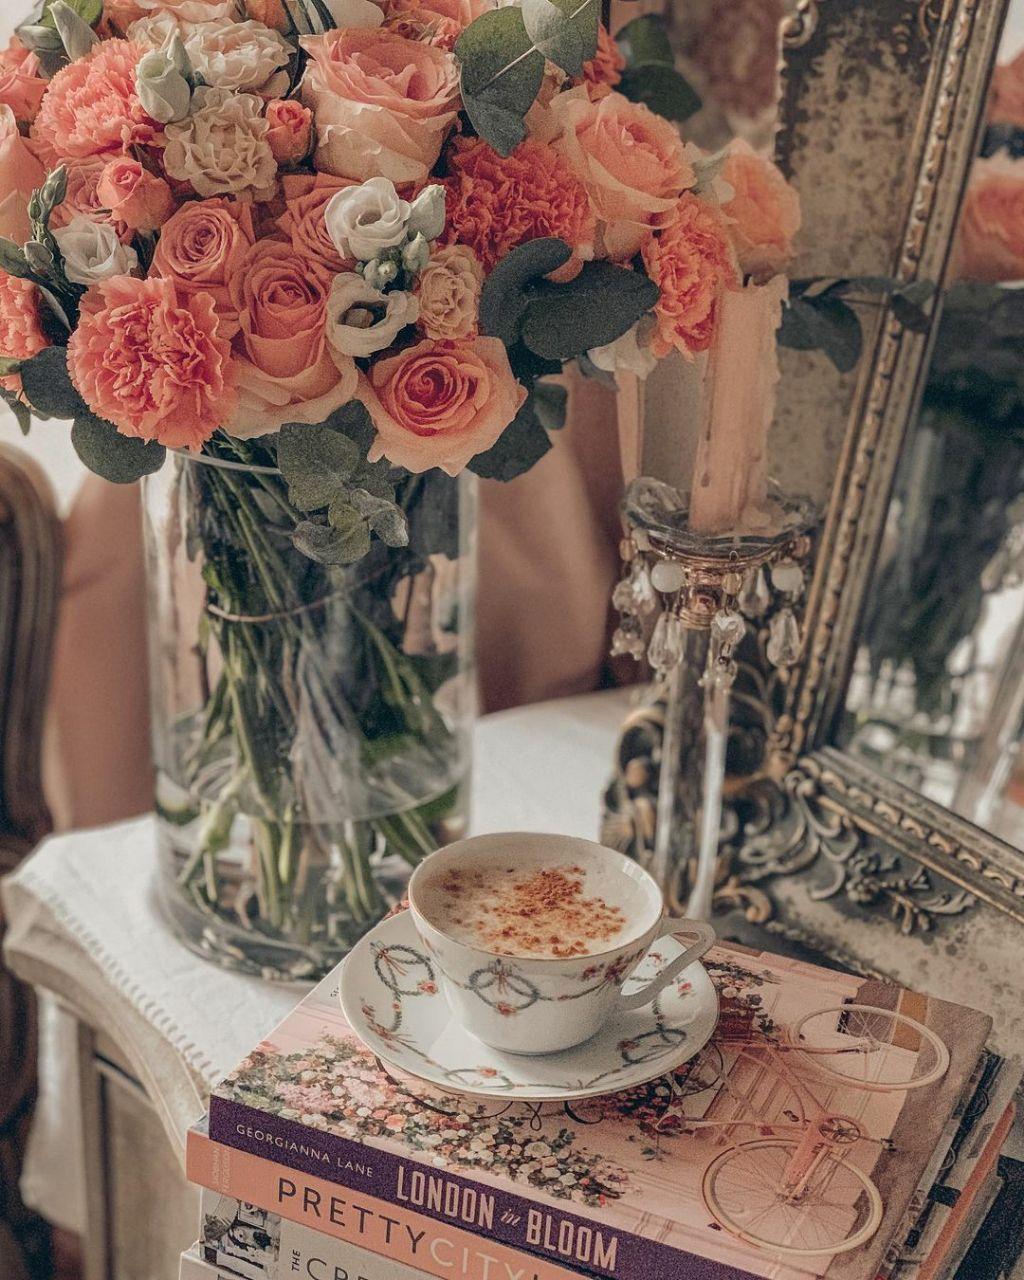 Image by Maryam Cheaib ❀